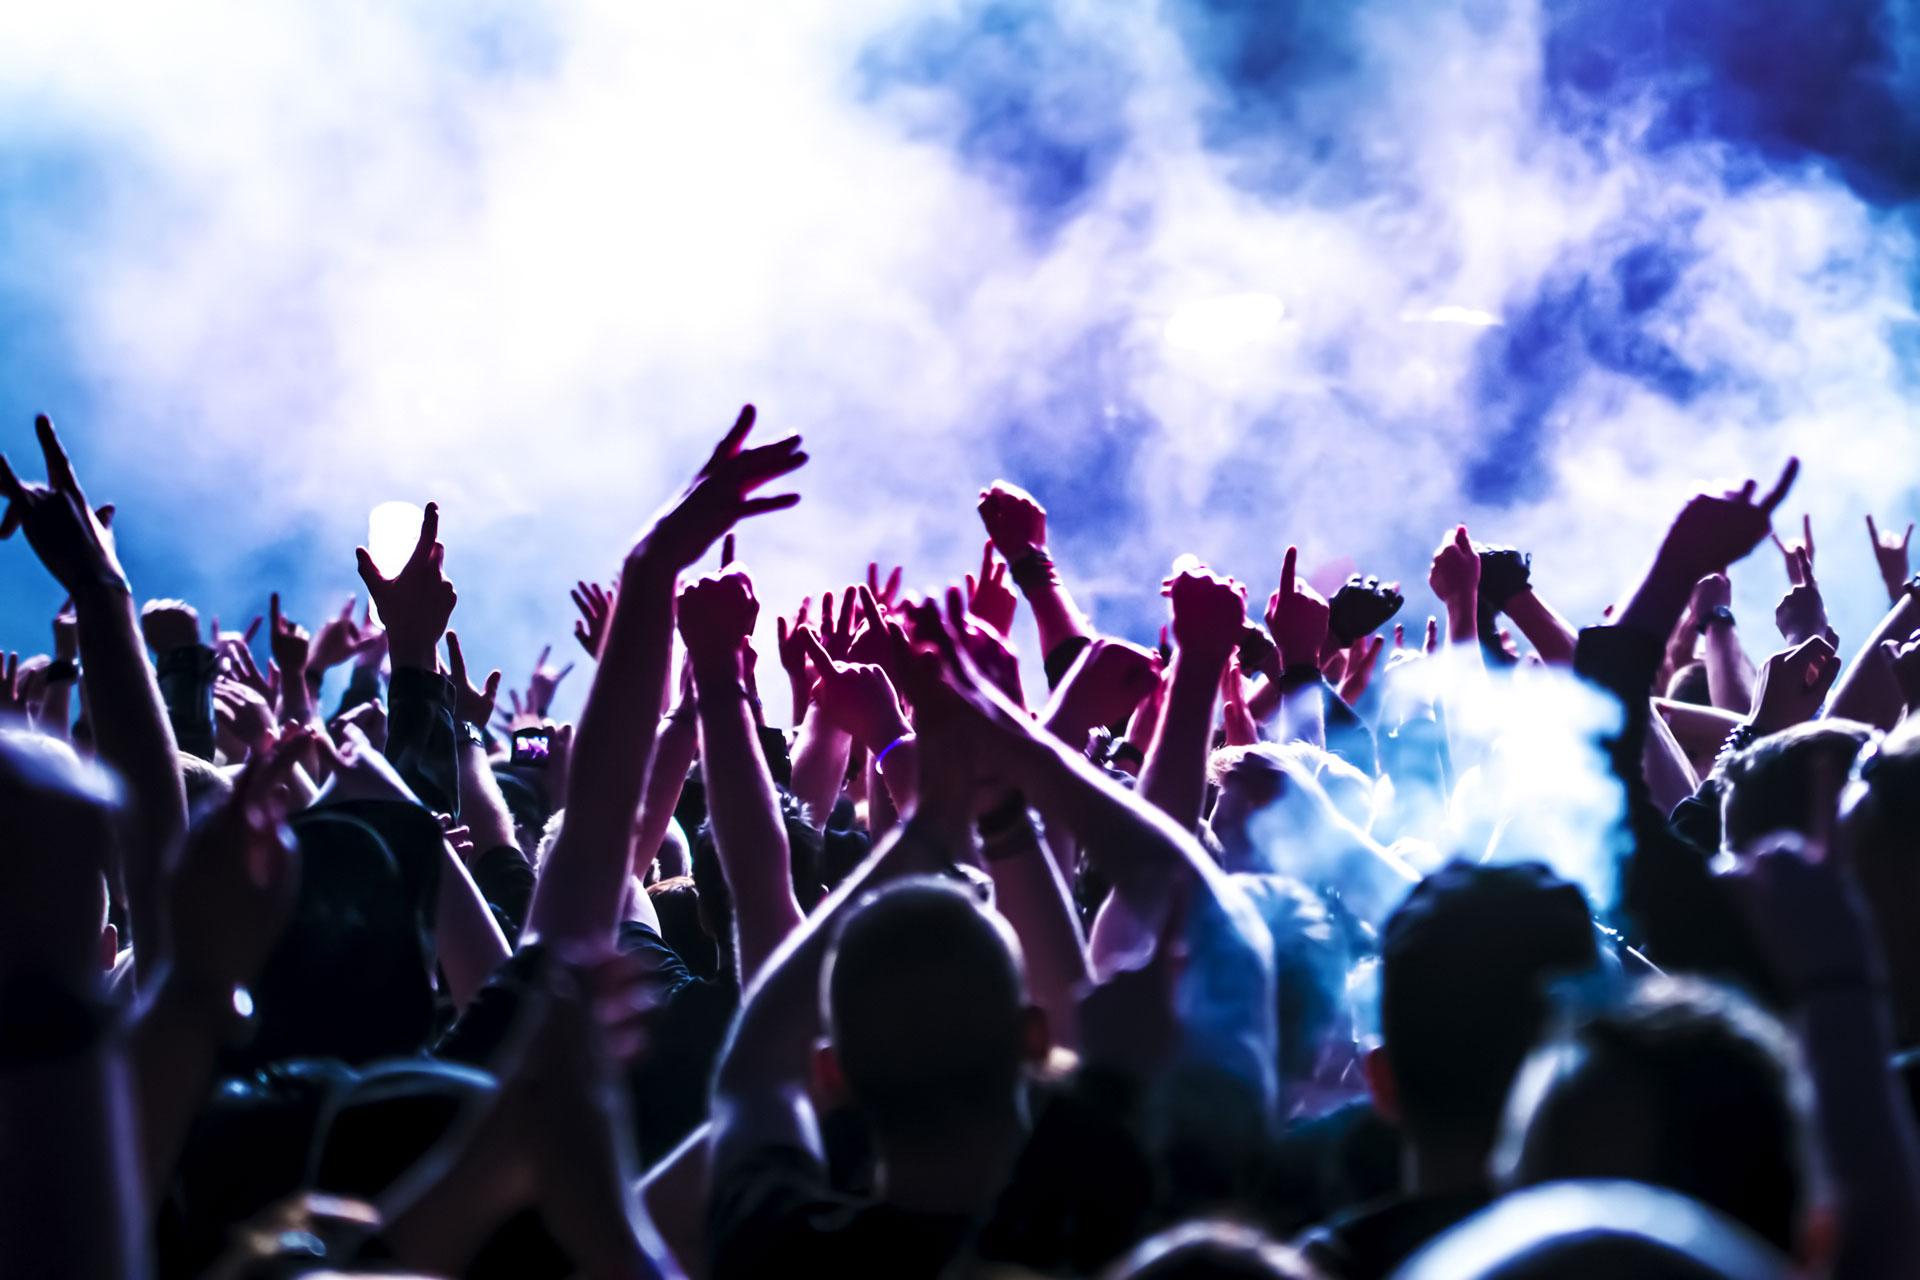 Jak fotit koncerty